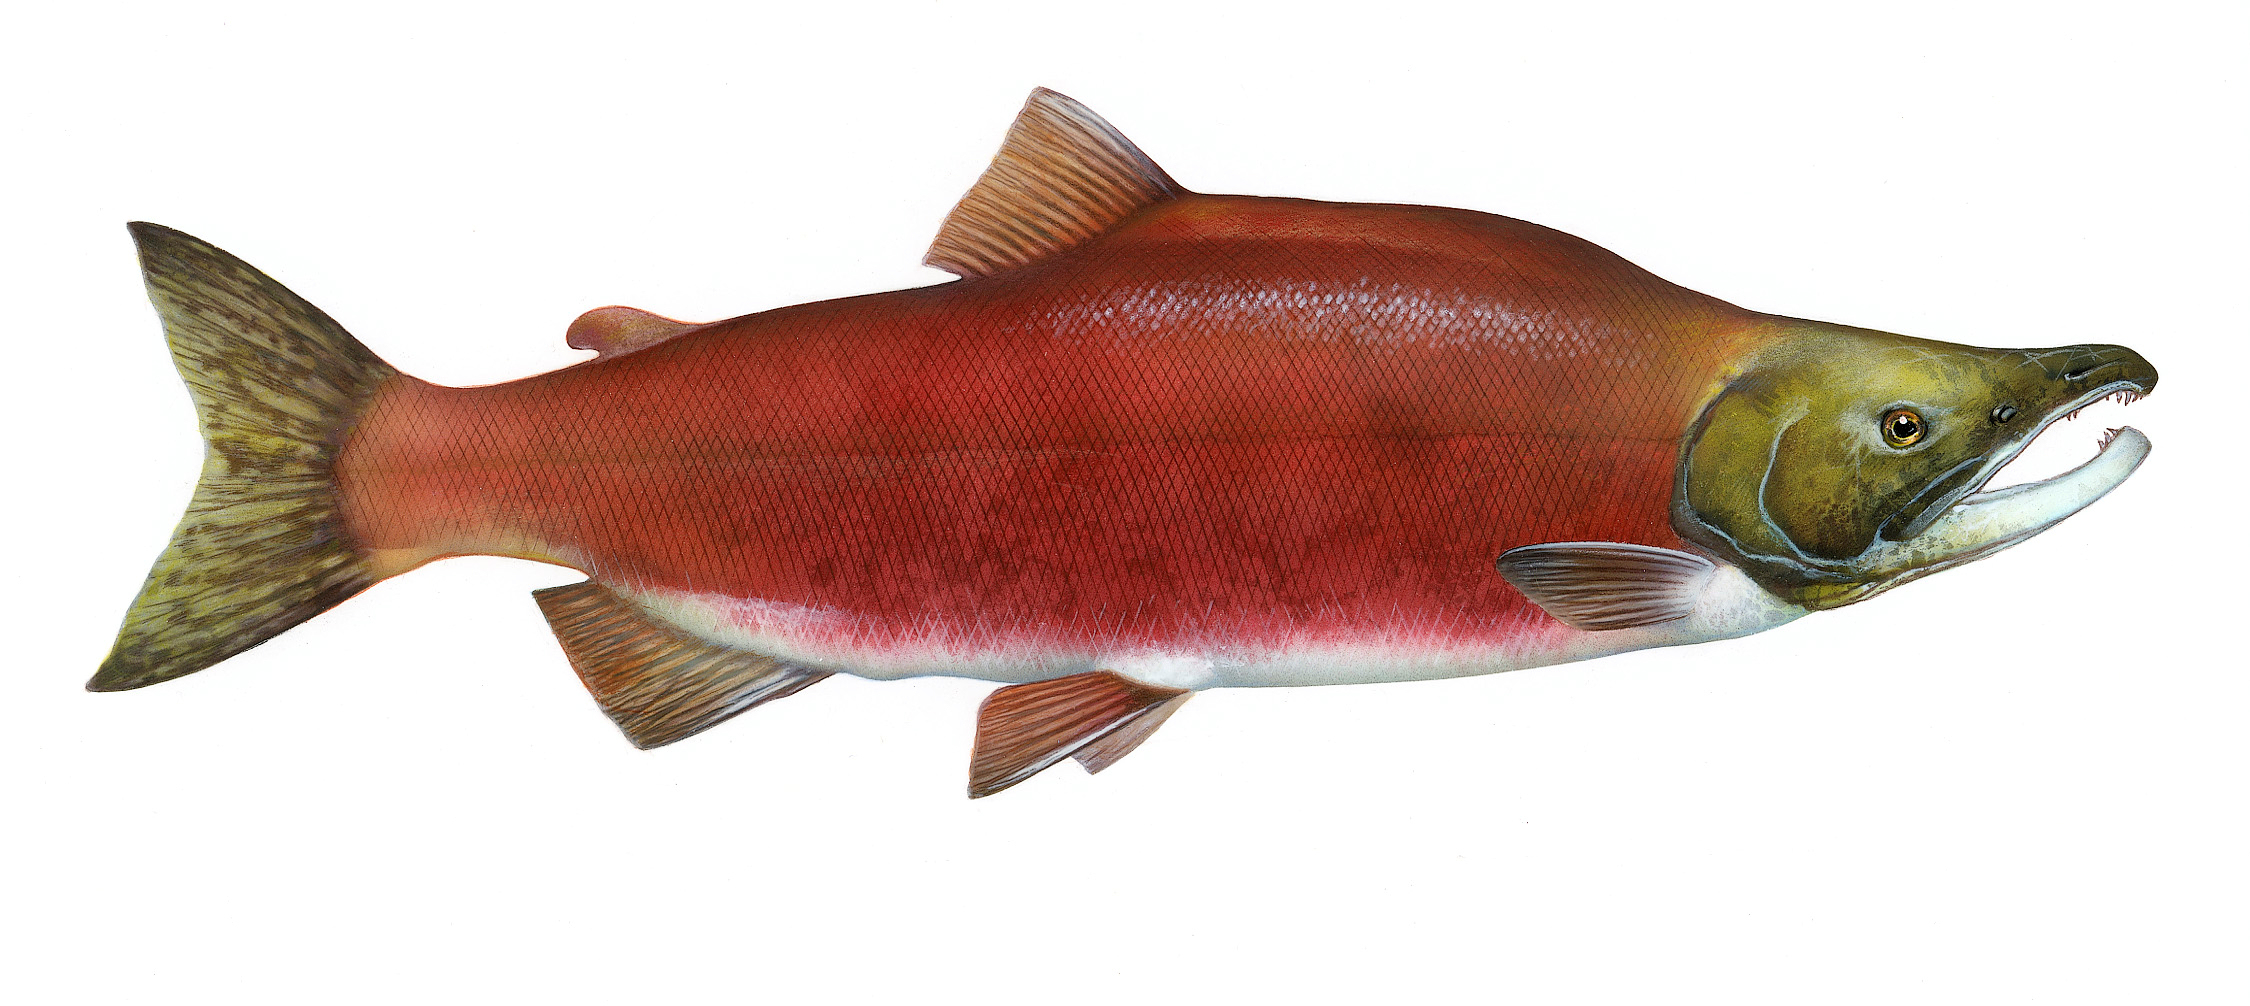 U S Fish And Wildlife Service Biologist Joseph Skorupa Letter